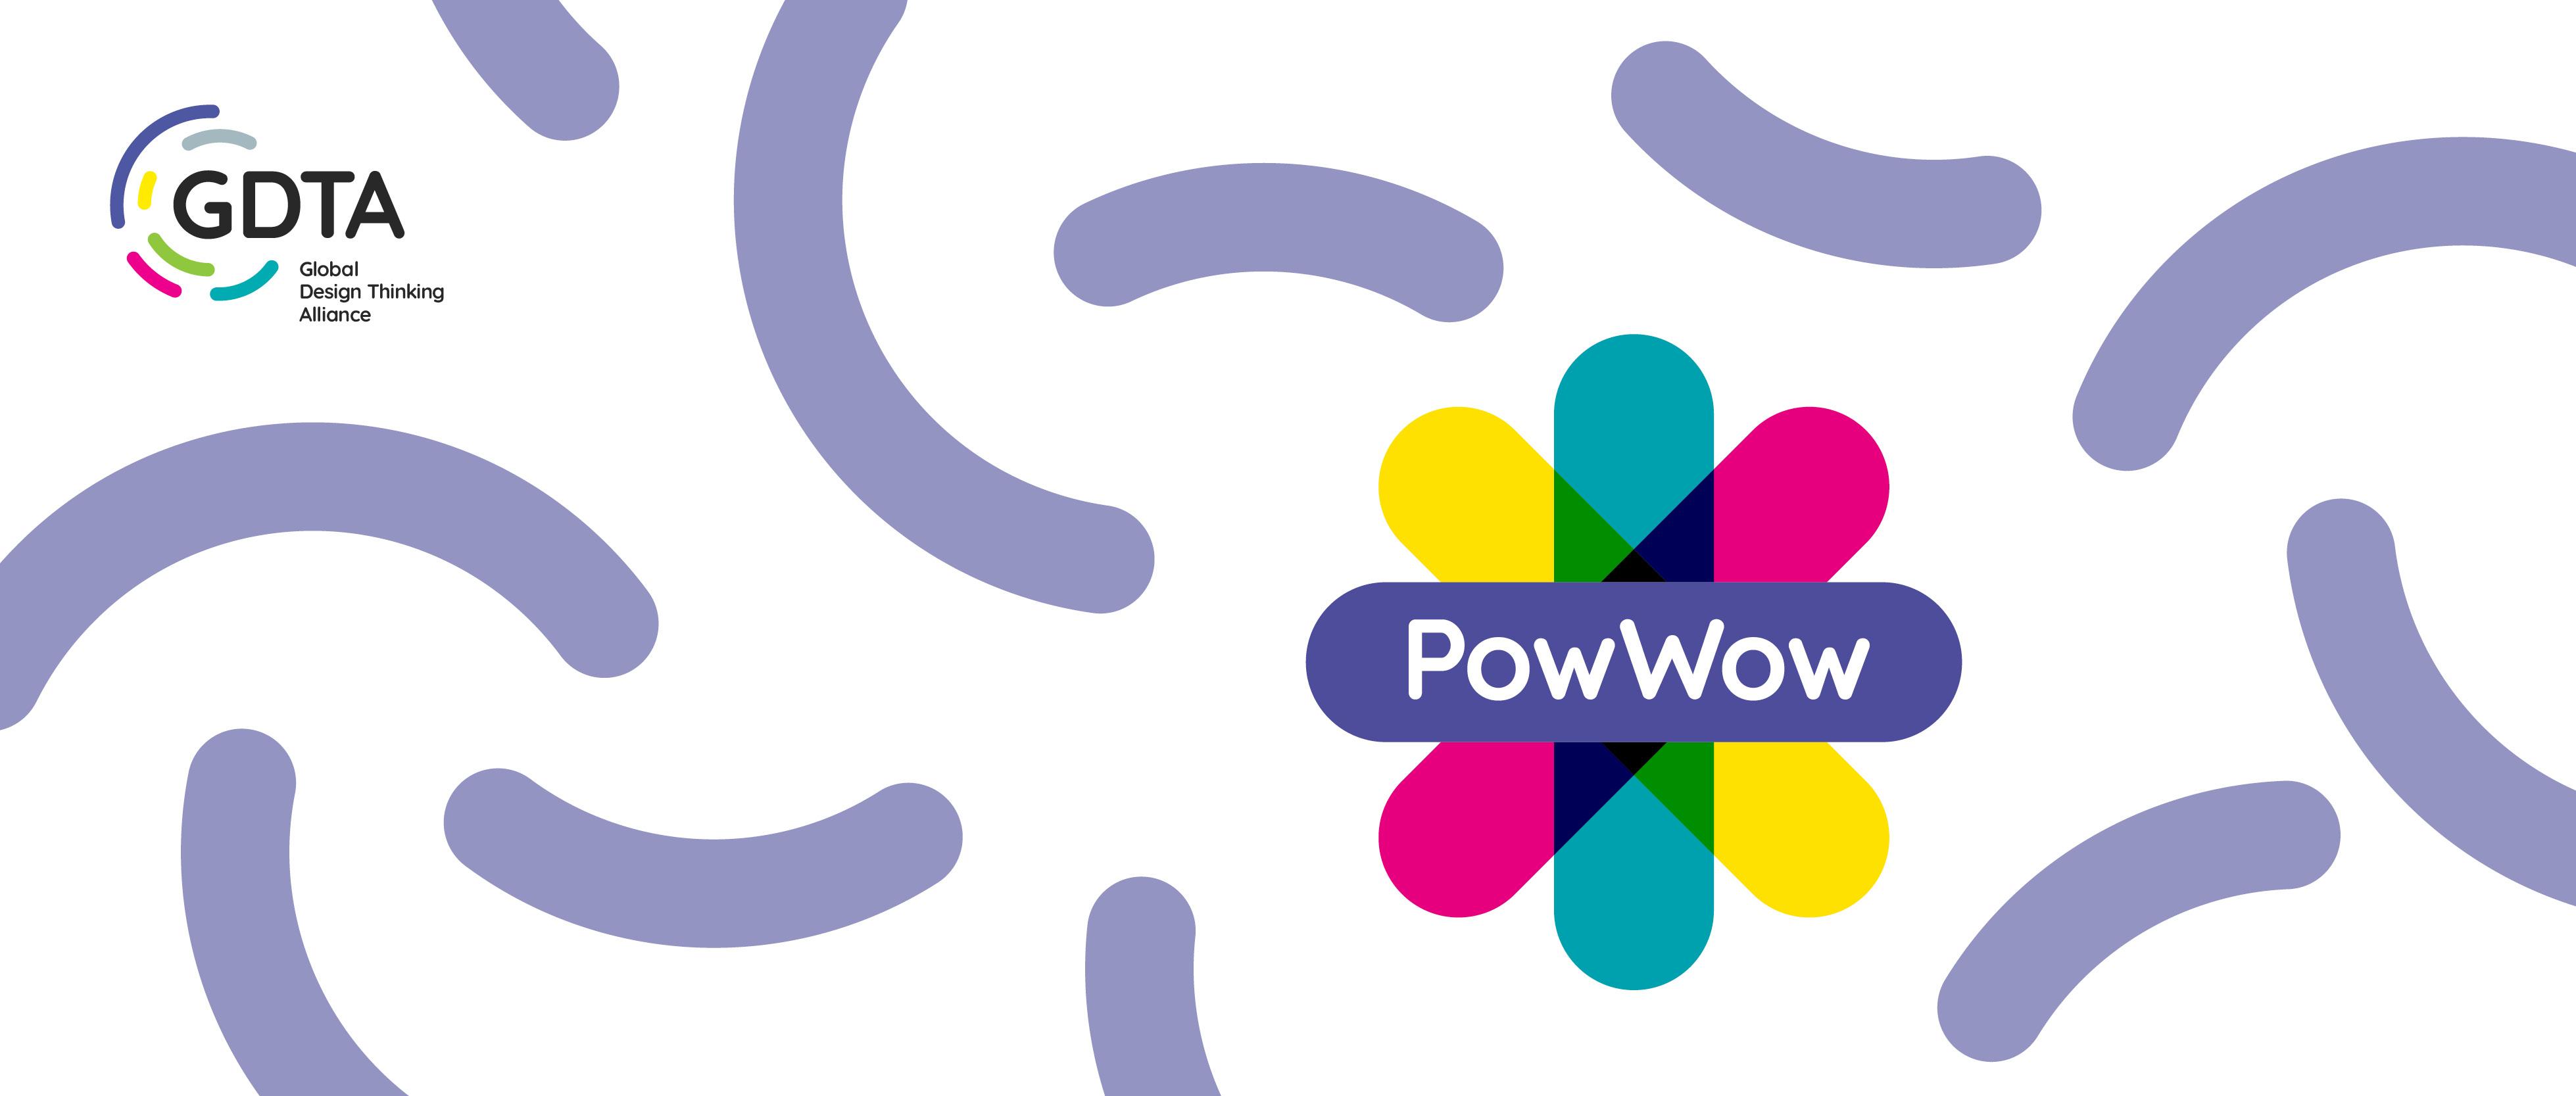 GDTA PowWow online event series